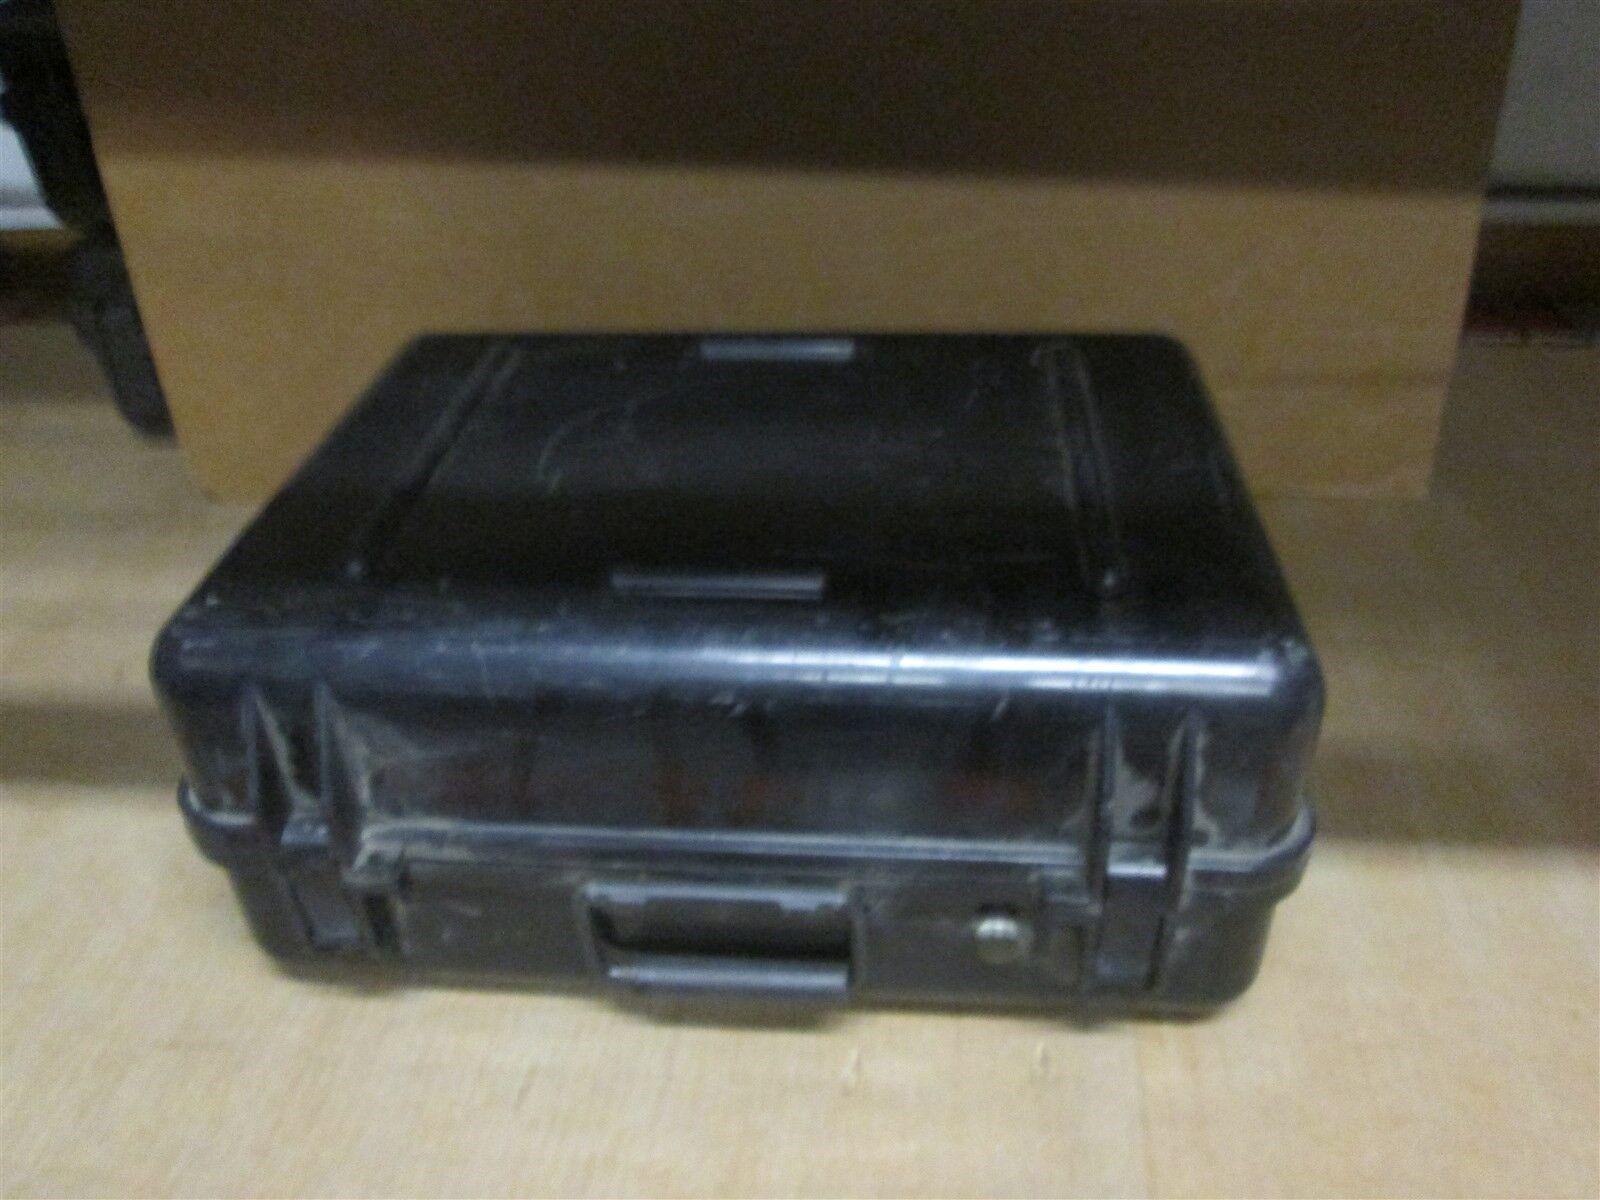 21x17x9 Starlight Hard Case Mounts Compartments Dry Box Weathertight Gun Camera